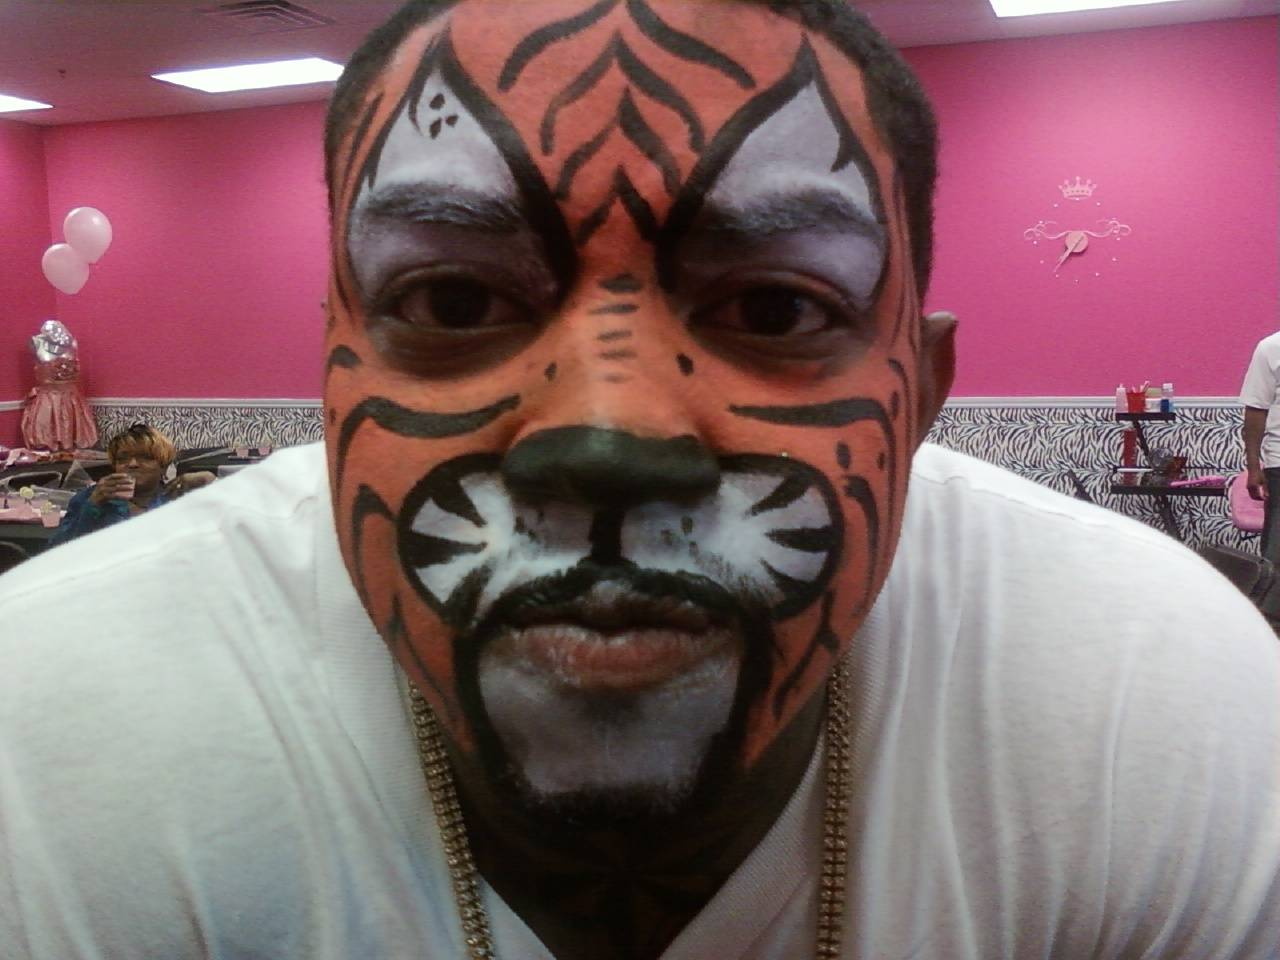 Lil' Scrappy Tiger